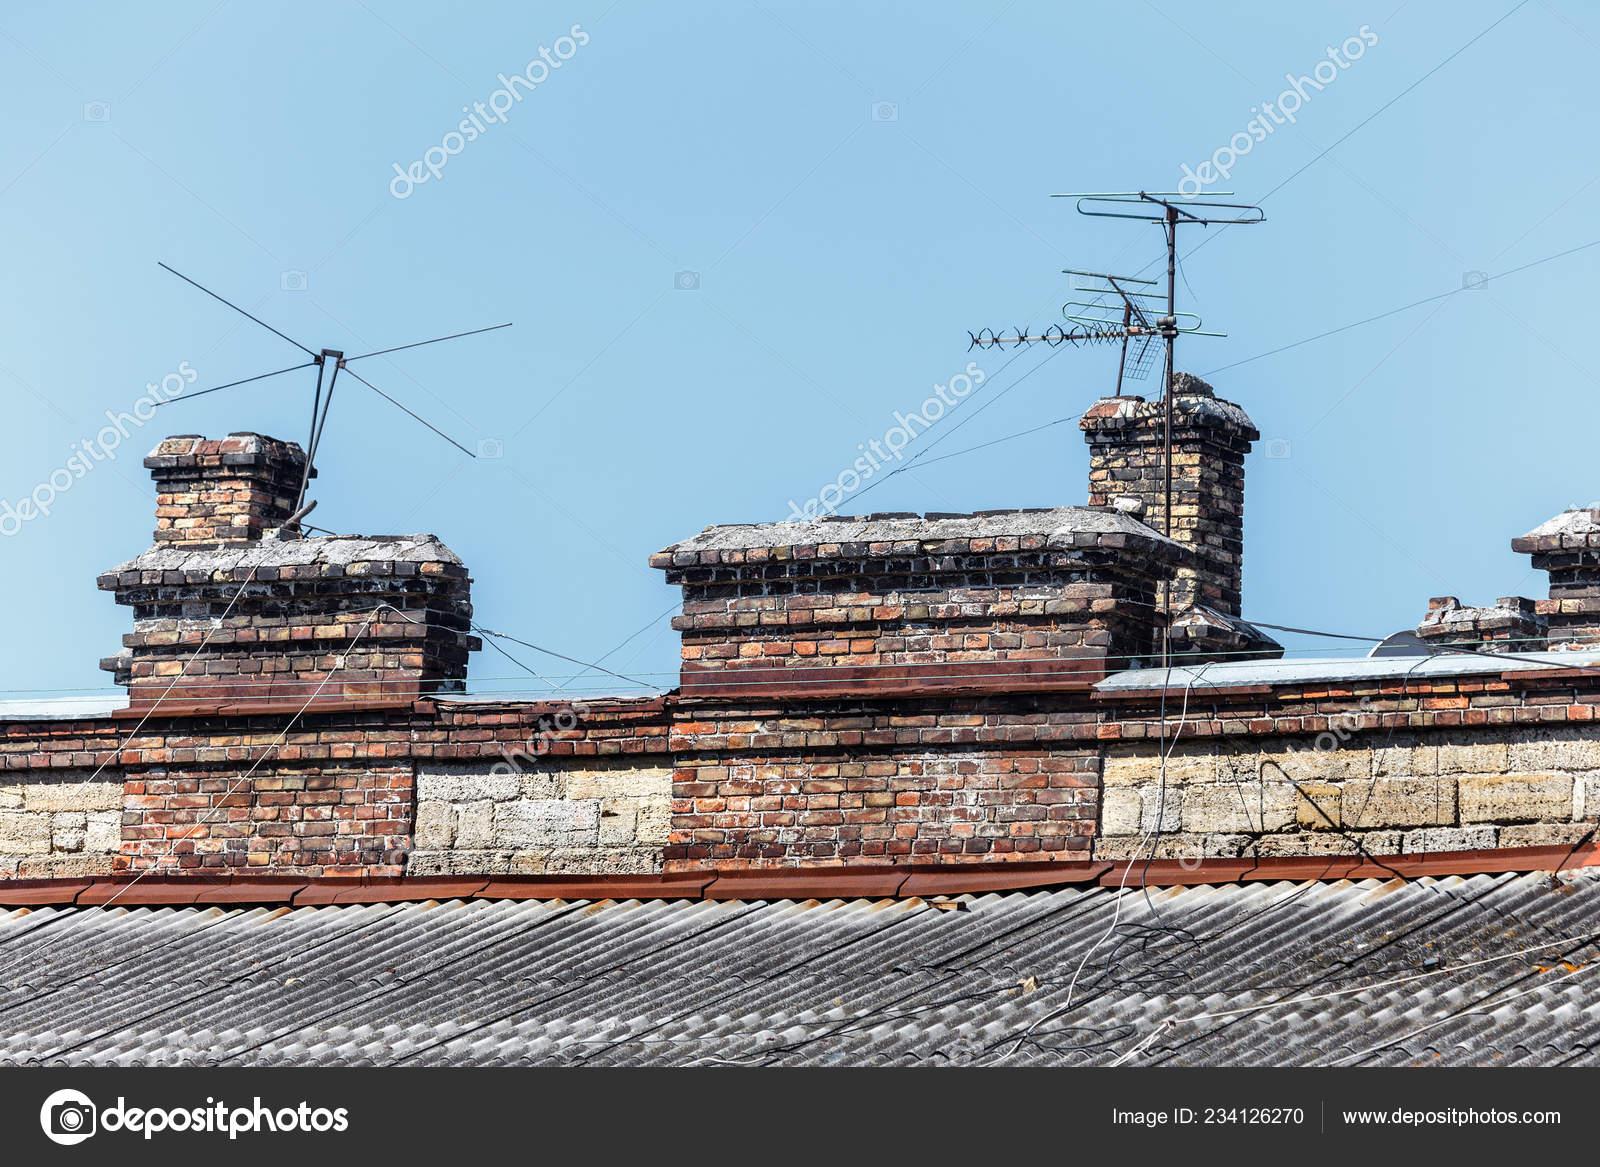 Roof Old Building Old Damaged Chimneys Brick Broken Television Antenna Stock Photo C Alesik 234126270